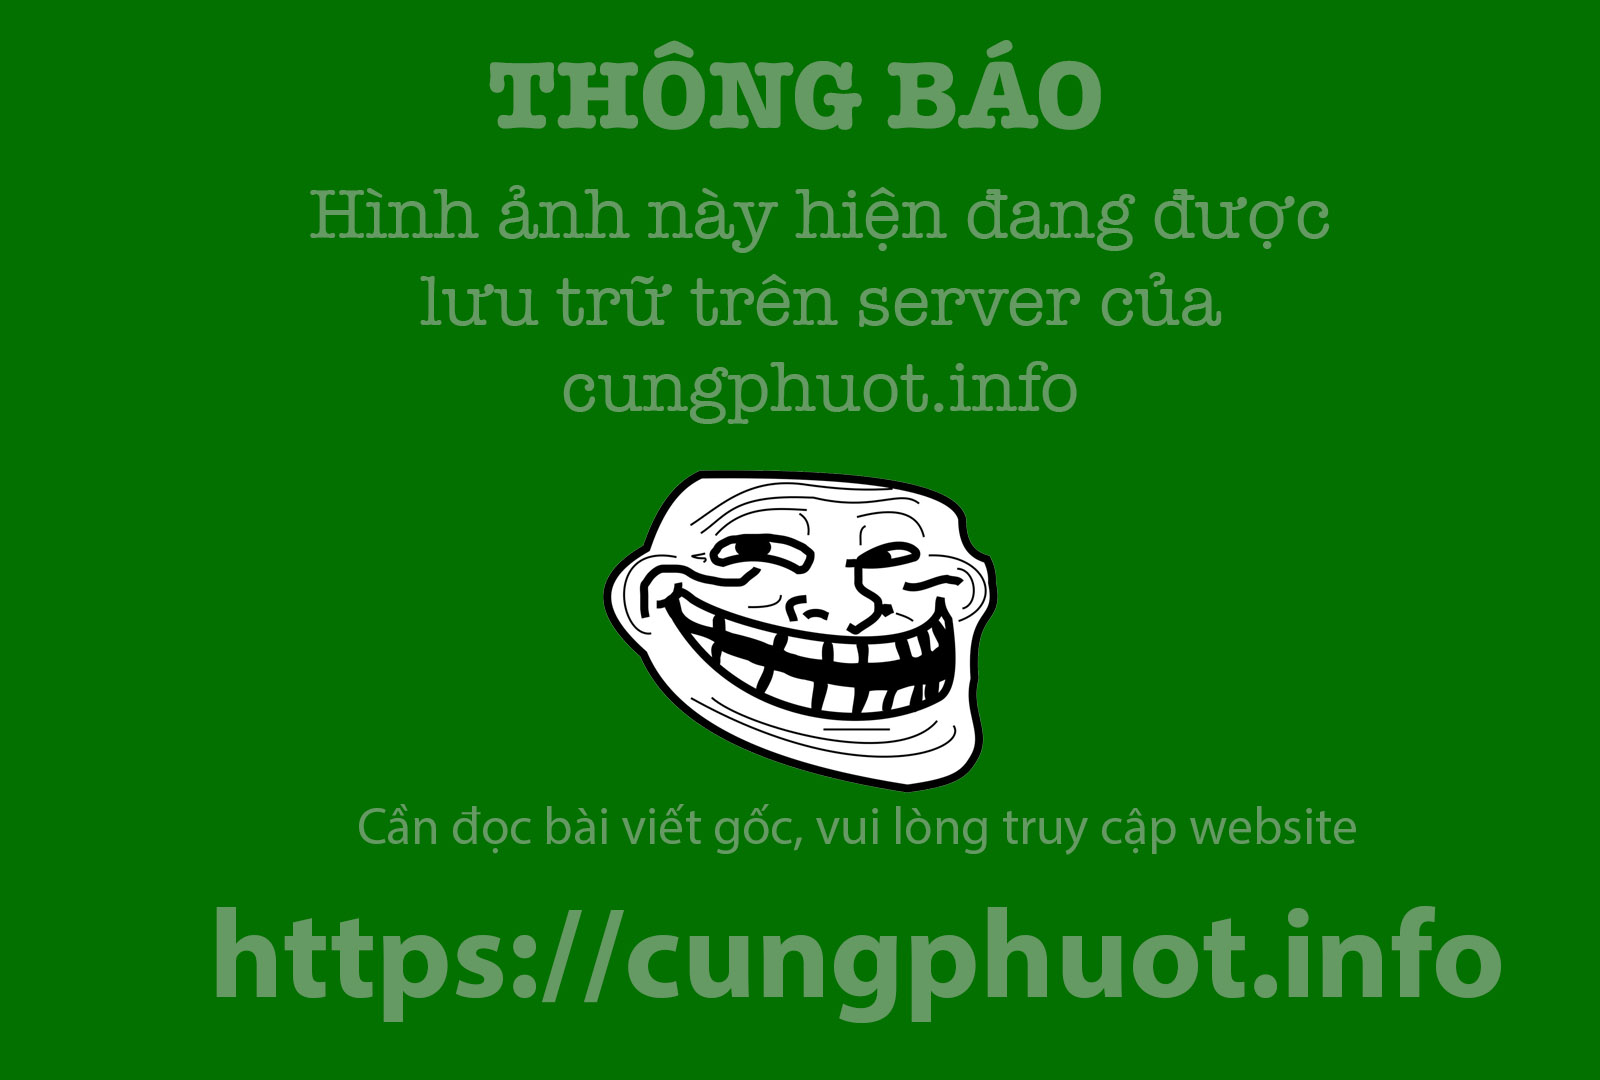 Binh minh tuyet dep tren nhung doi che Tan Cuong hinh anh 2